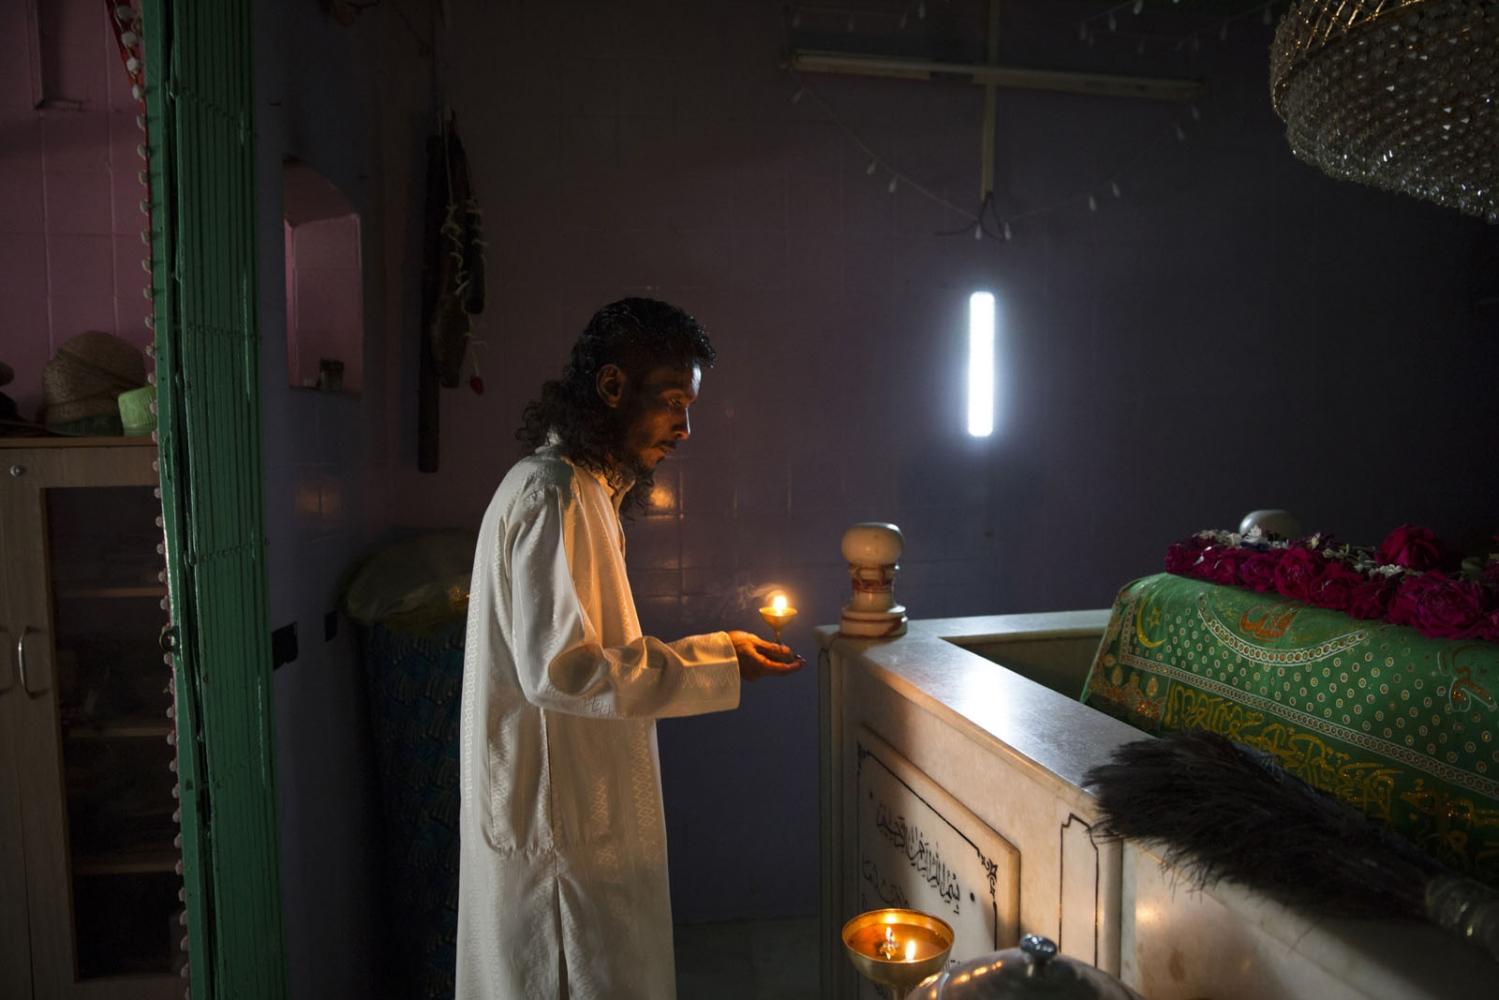 Art and Documentary Photography - Loading Sidi_SouthAsia37.JPG